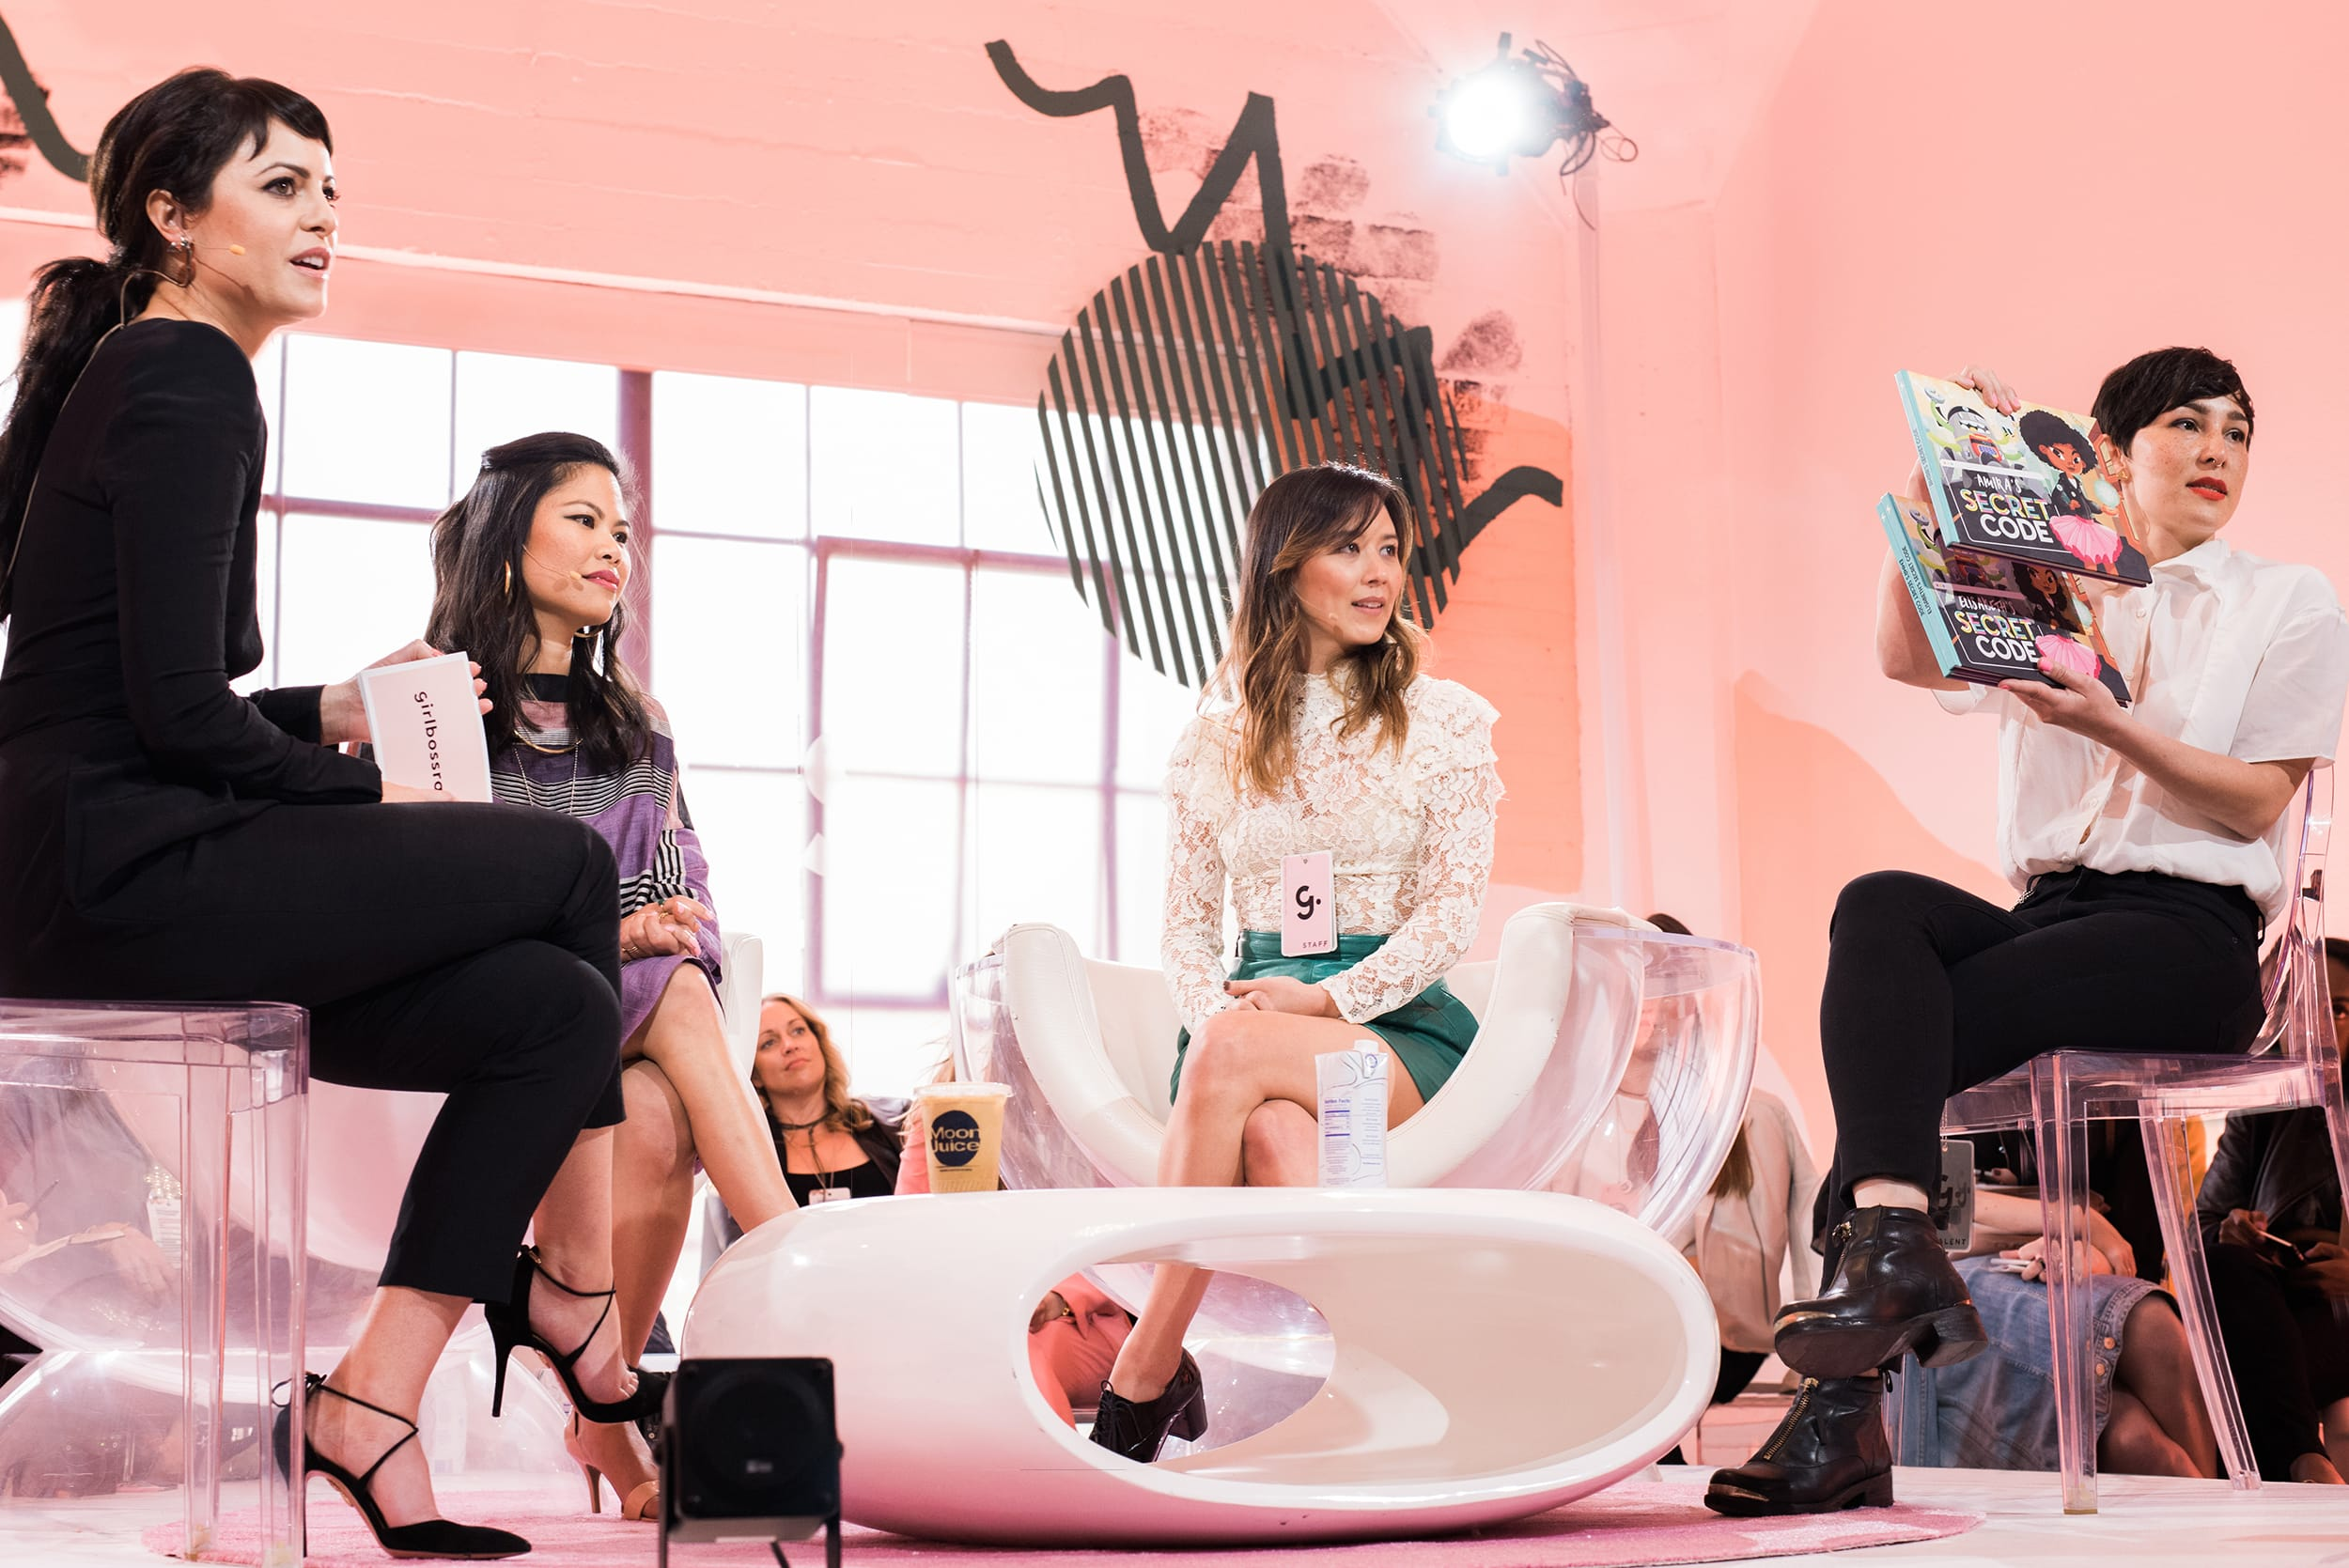 Girlboss Foundation Grant Winner with Sophia Amoruso